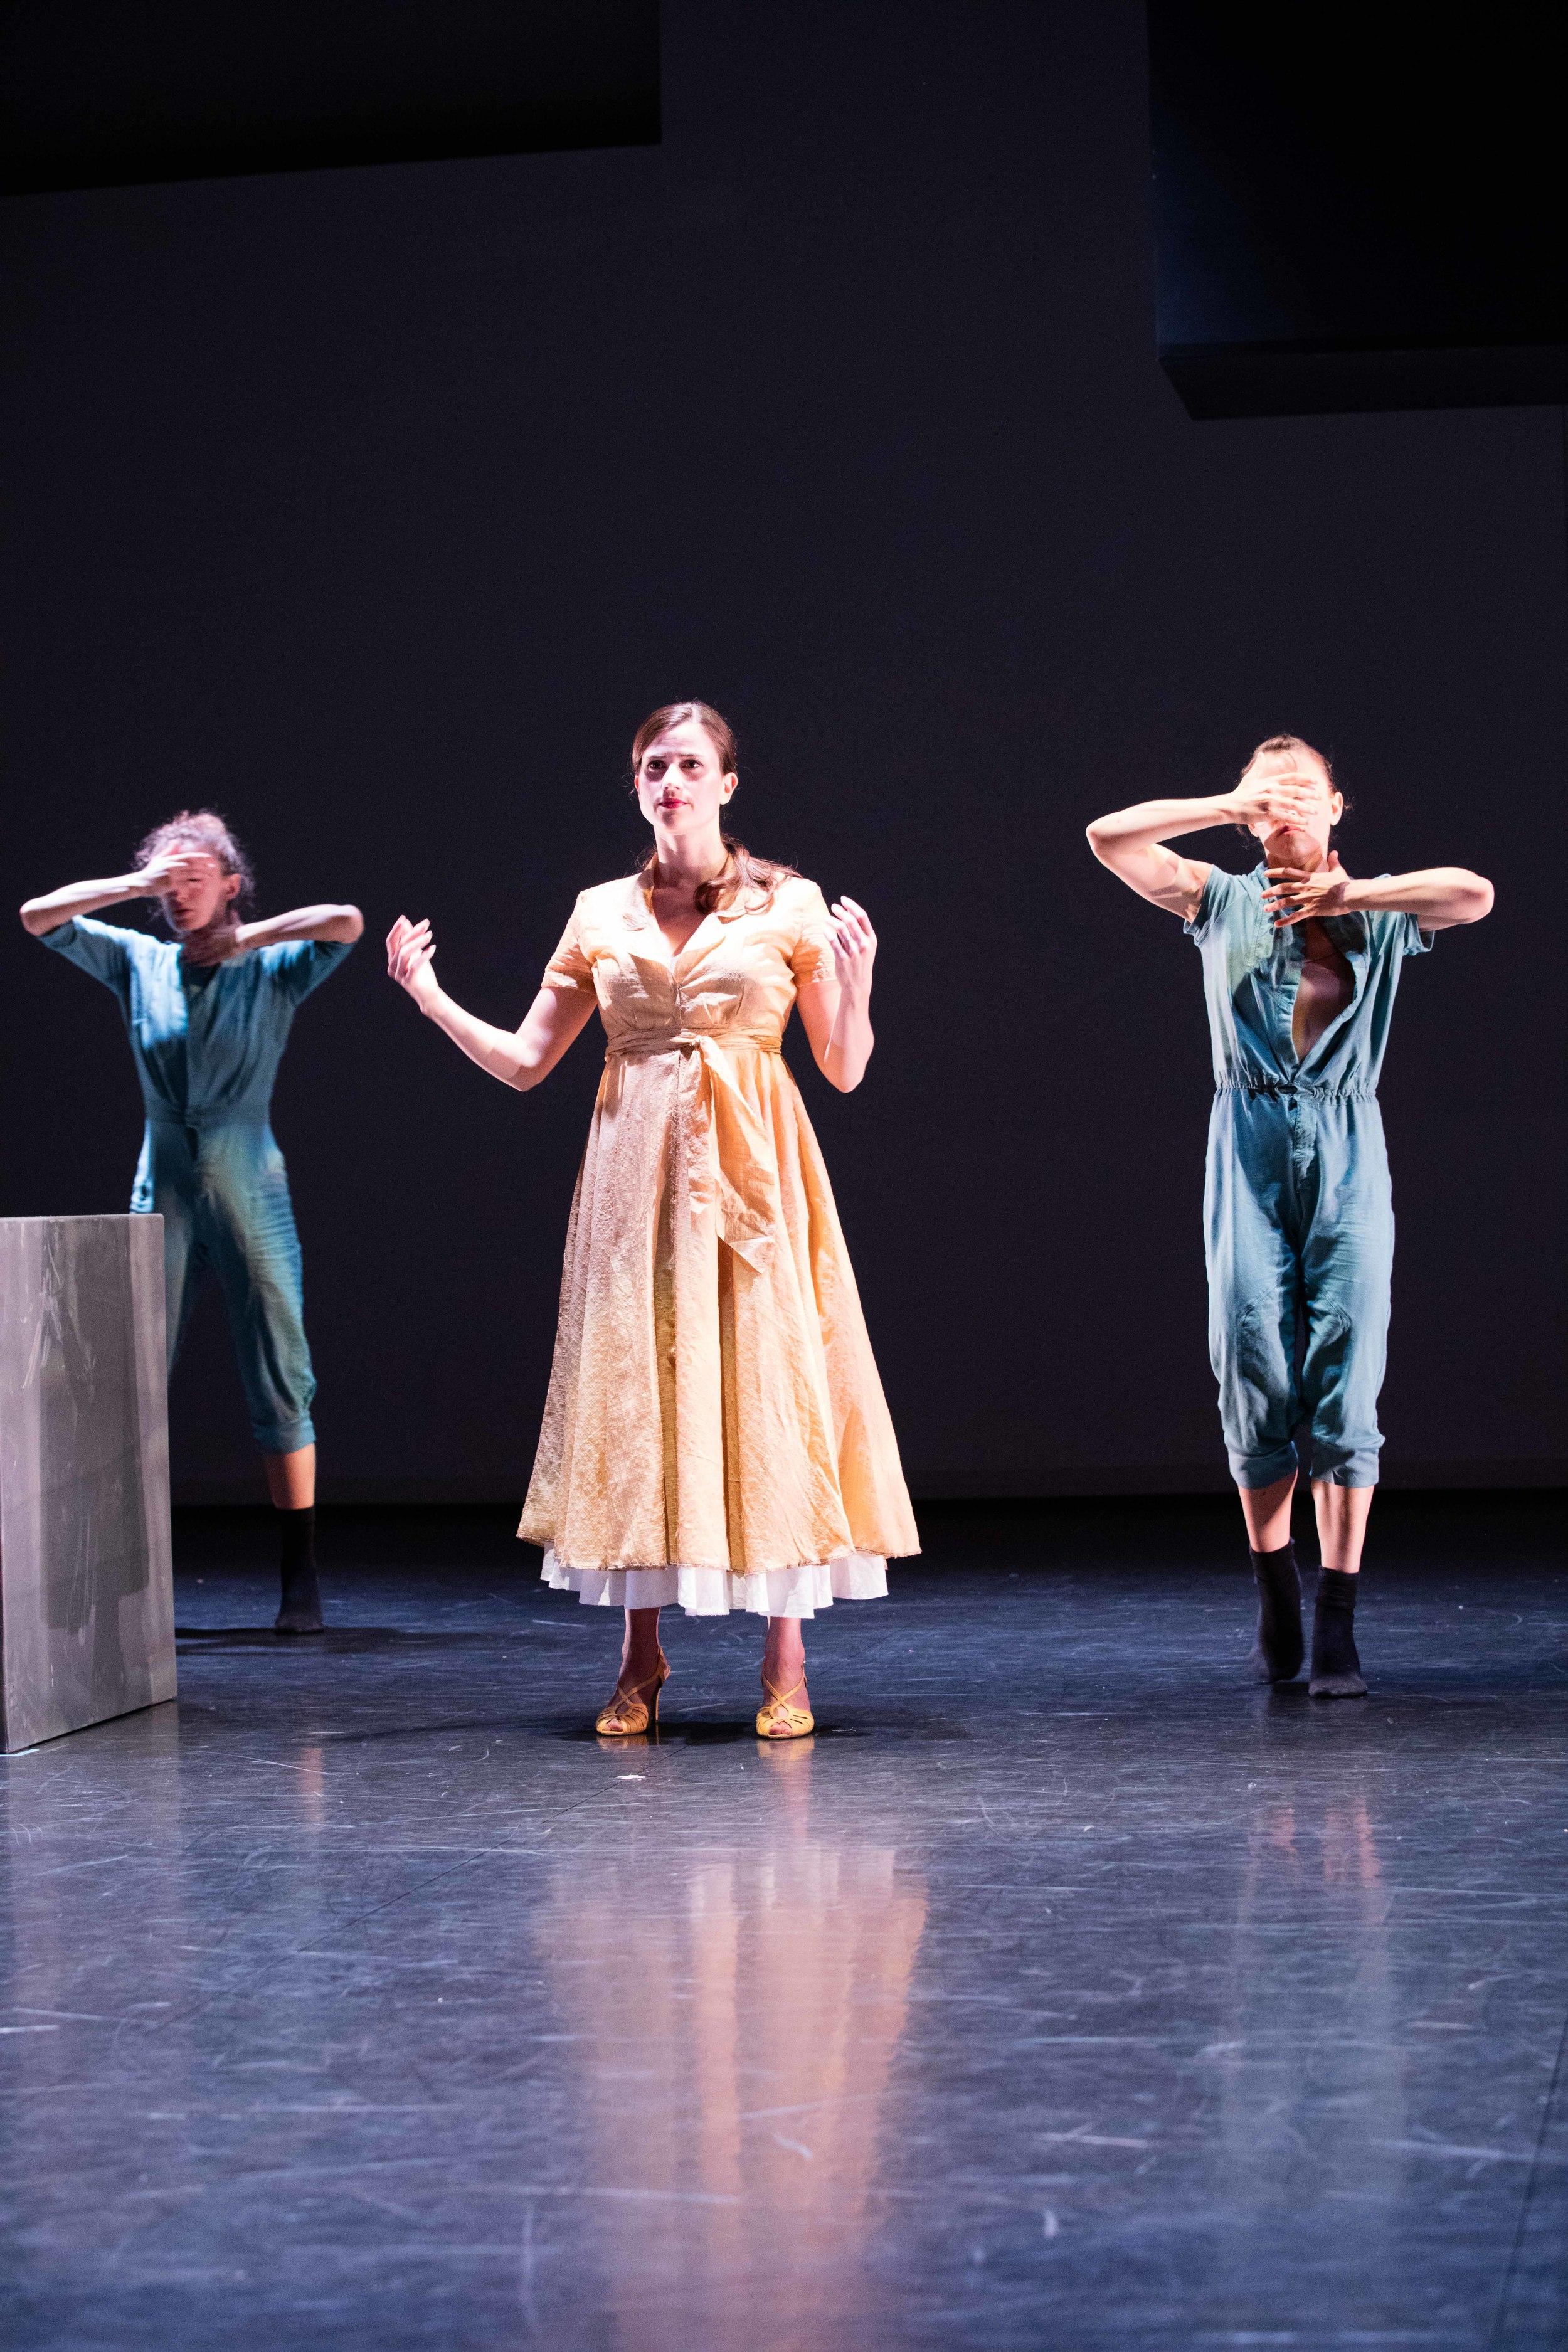 From the left: Nina Brindamour, Anna Ward, and Danielle Davidson/photo by Daniel J. van Ackere